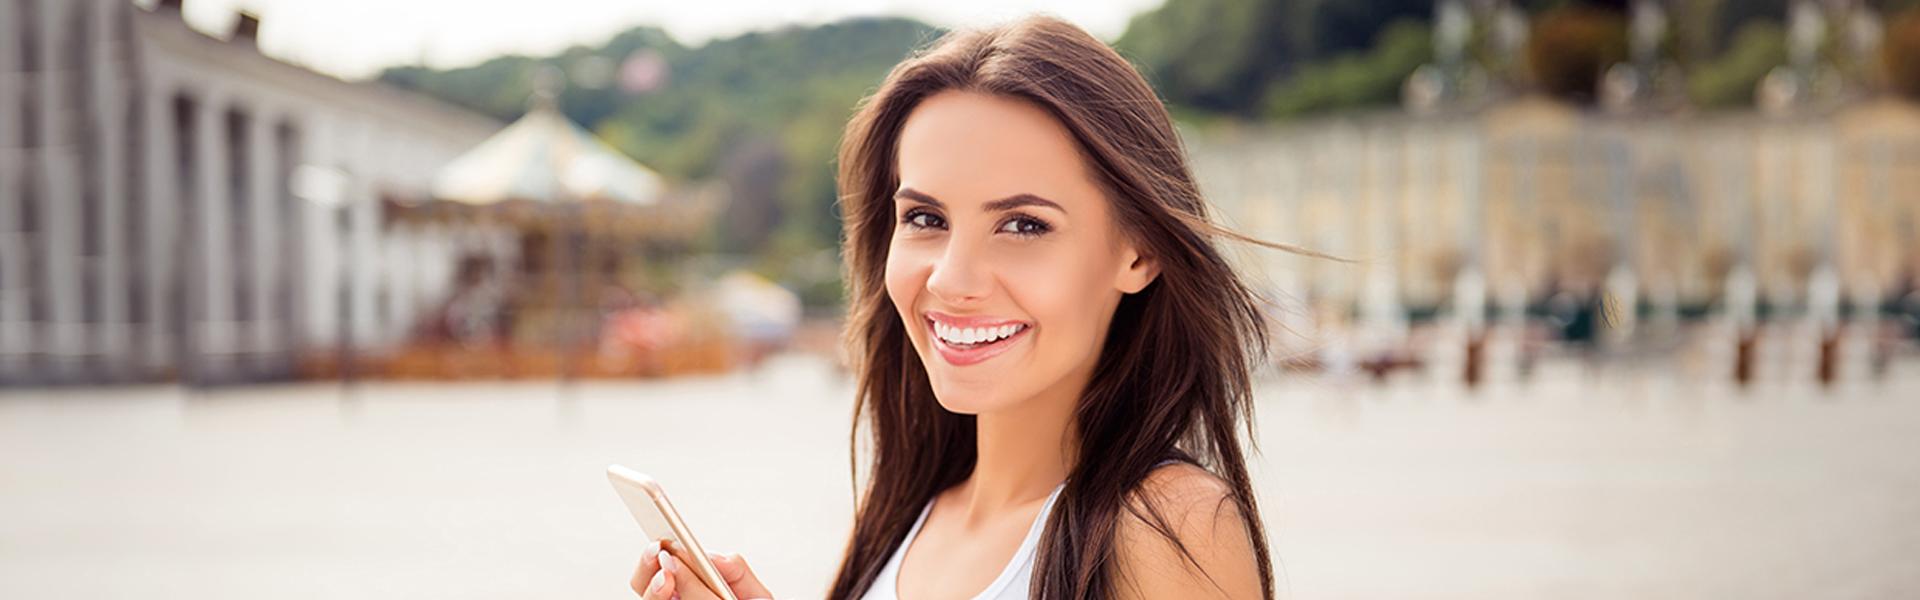 Straighten Your Teeth the Modern Way